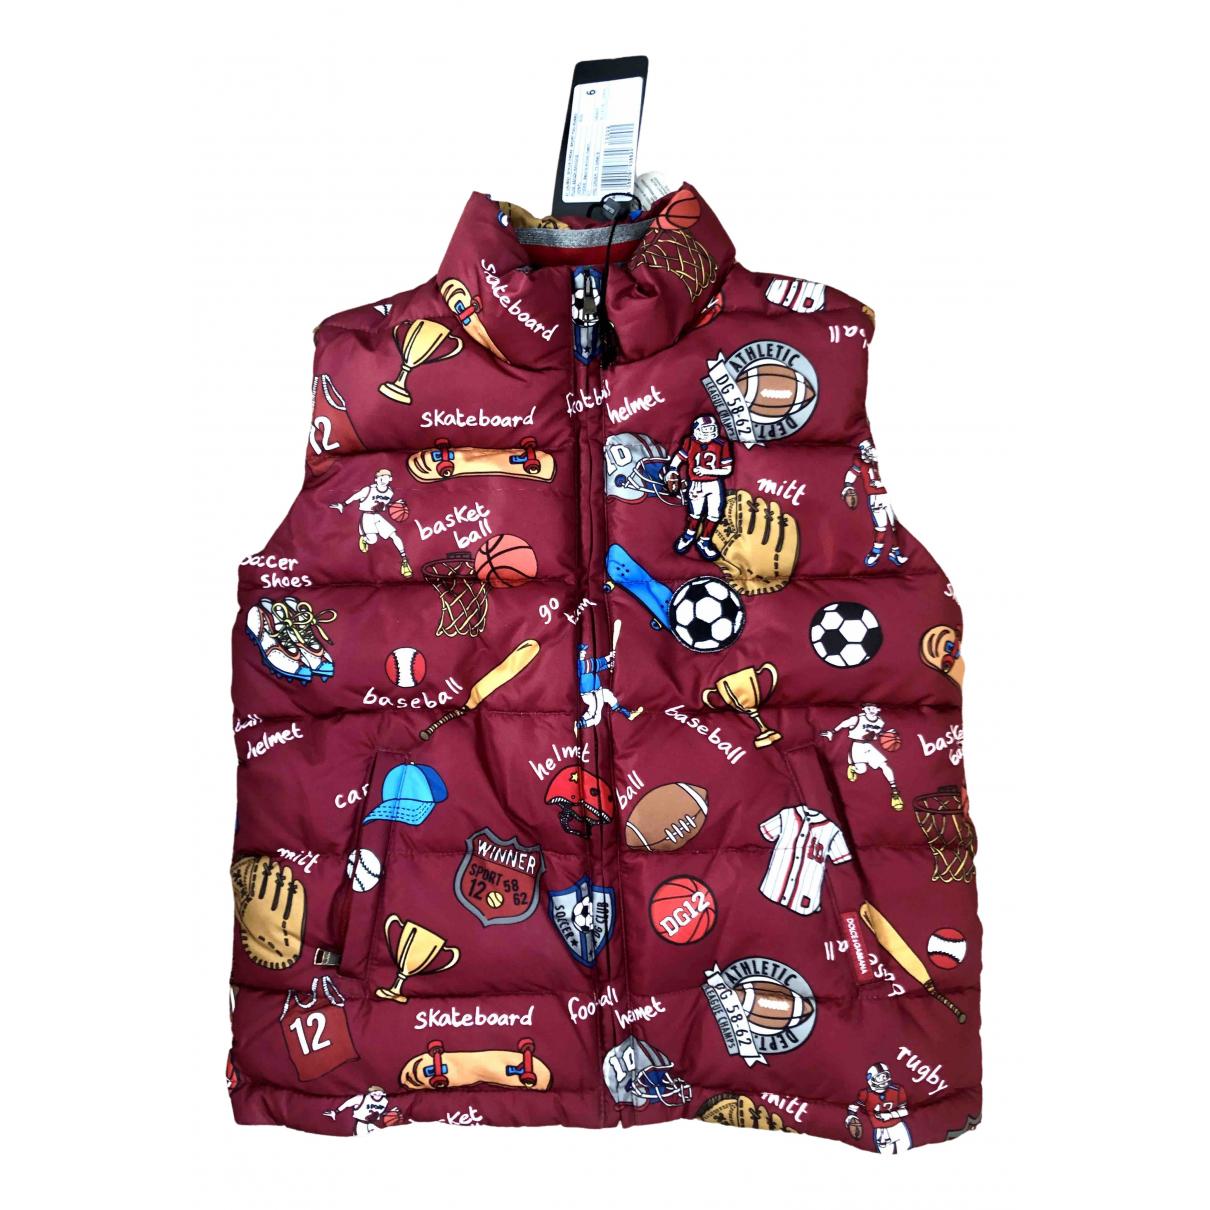 Dolce & Gabbana \N Jacke, Maentel in  Bunt Polyester